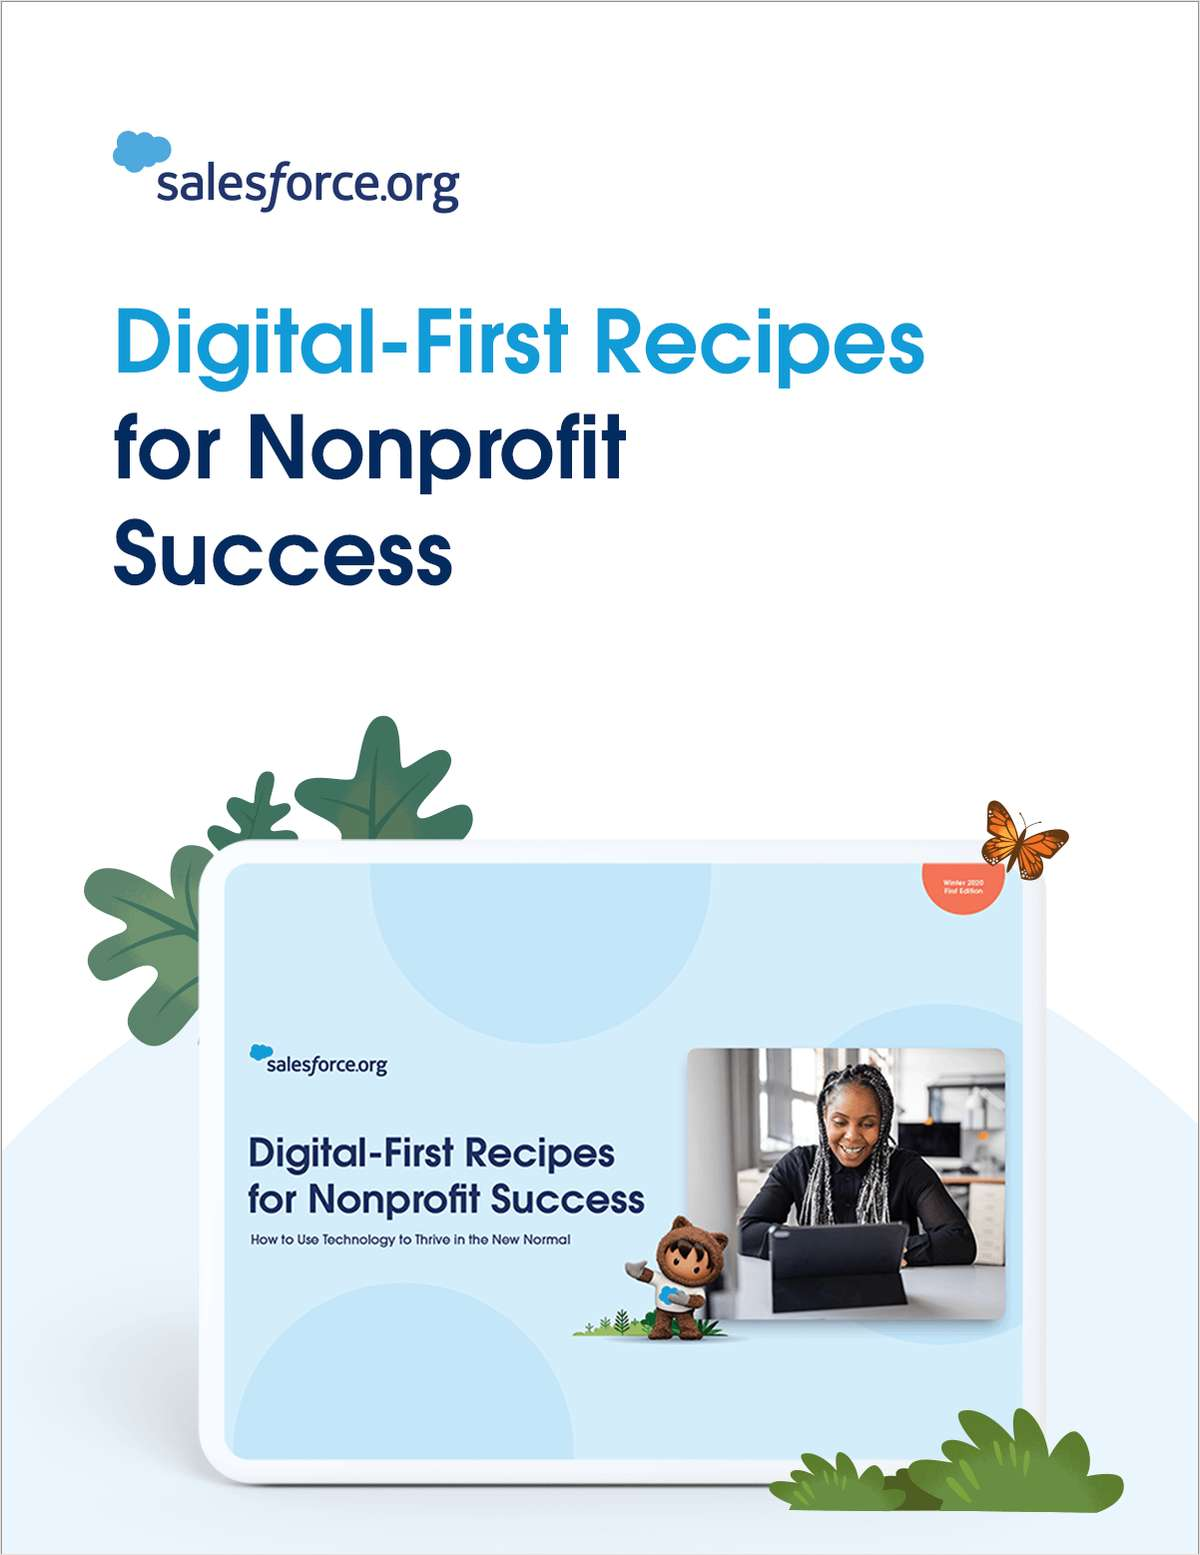 Digital-First Recipes for Nonprofit Success